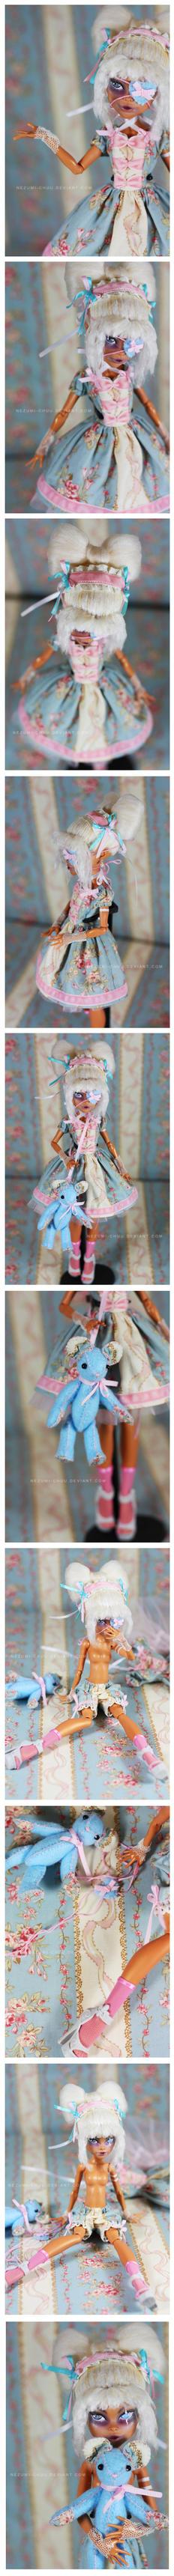 MH : Rorita Nefera Custom by Nezumi-chuu